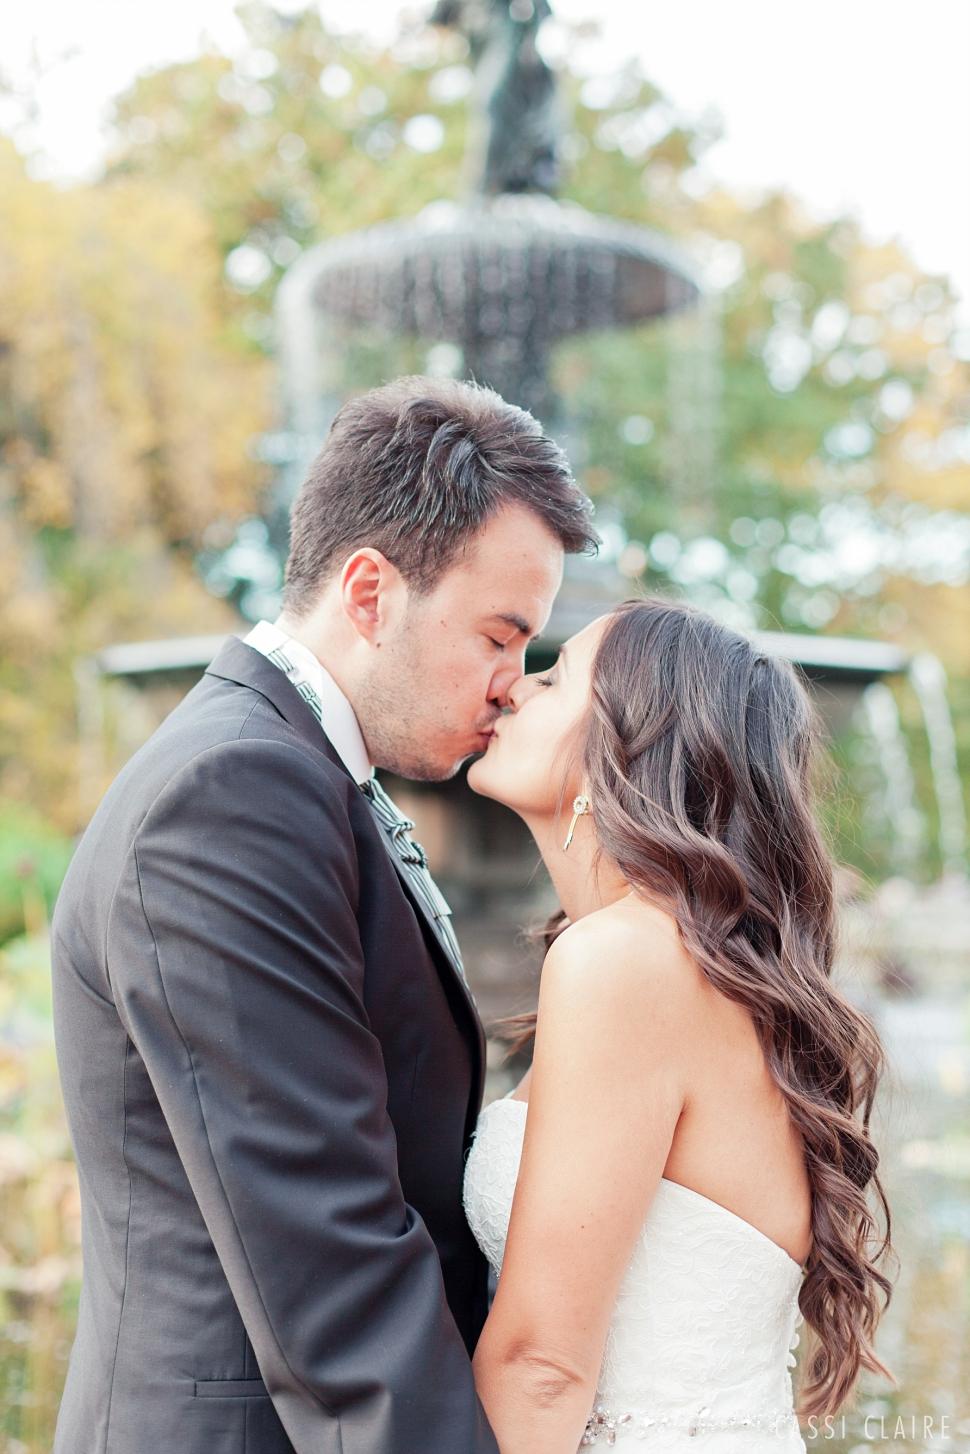 Bethesda-Terrace-NYC-Wedding-Photos_CassiClaire_04.jpg